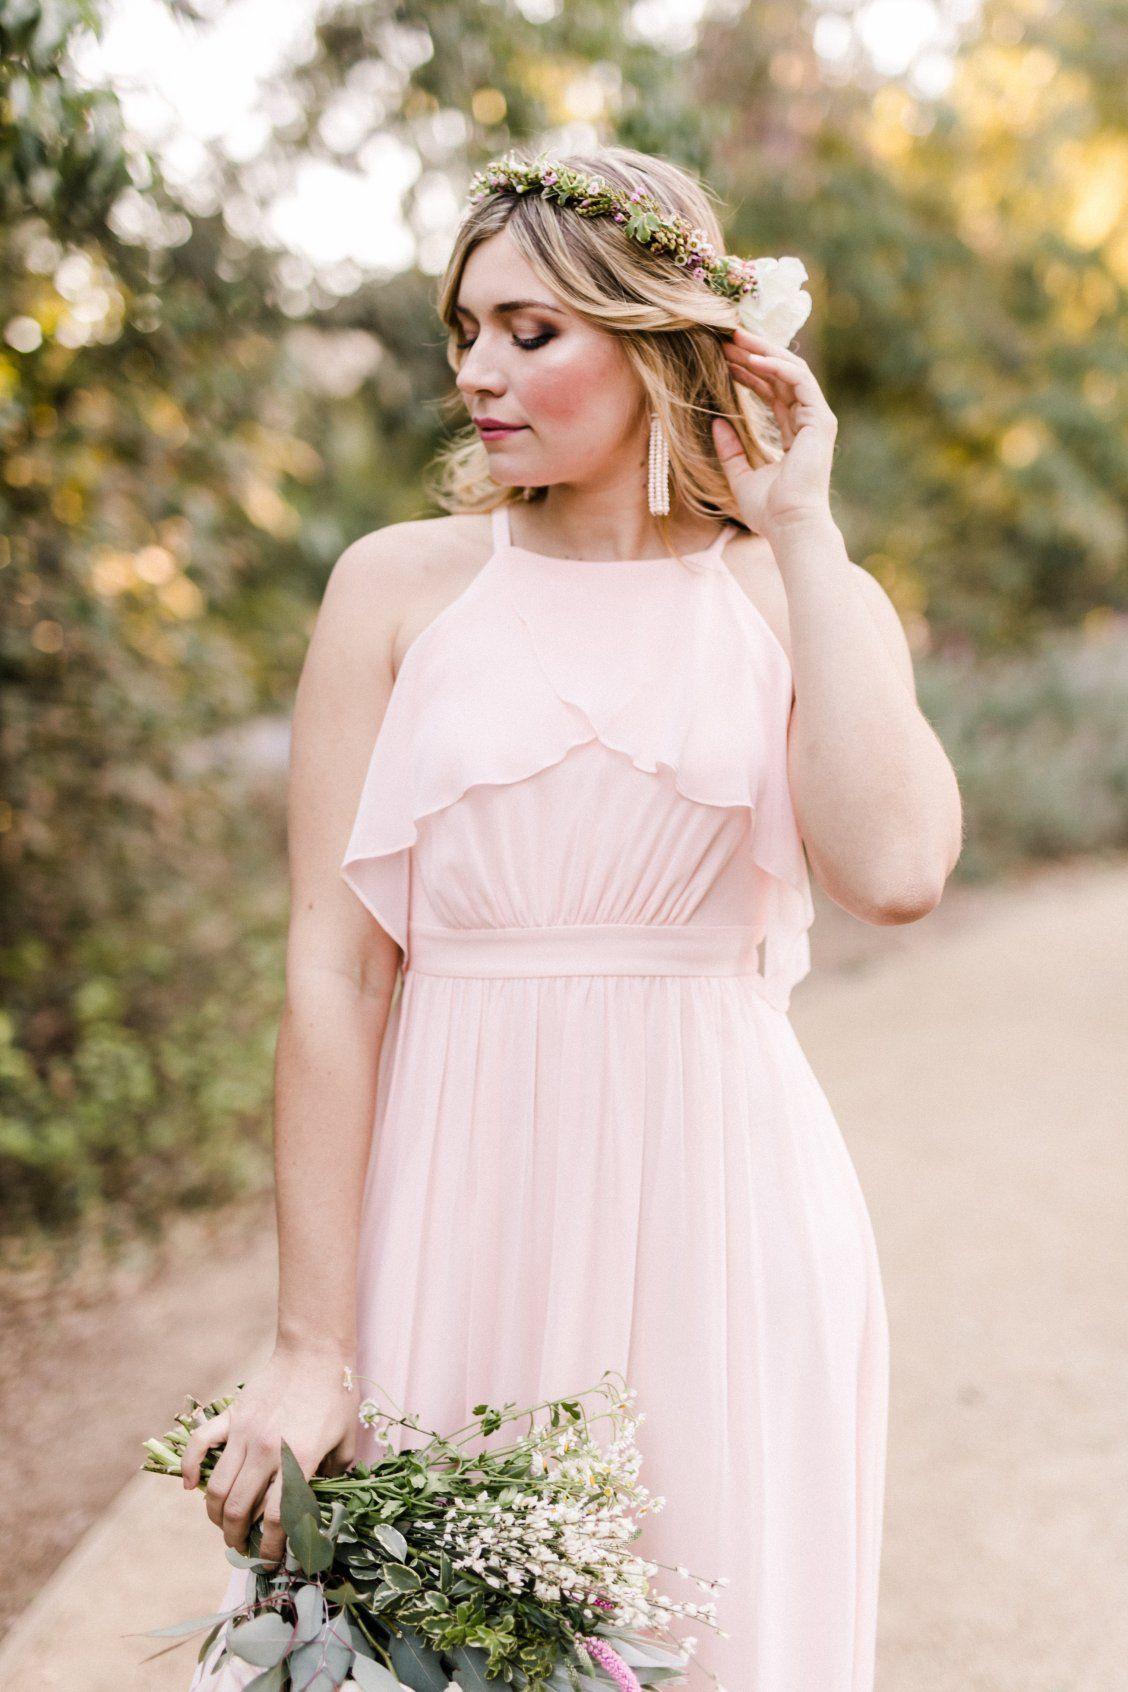 Ruffle pink bridesmaid dress that can be worn sleeveless